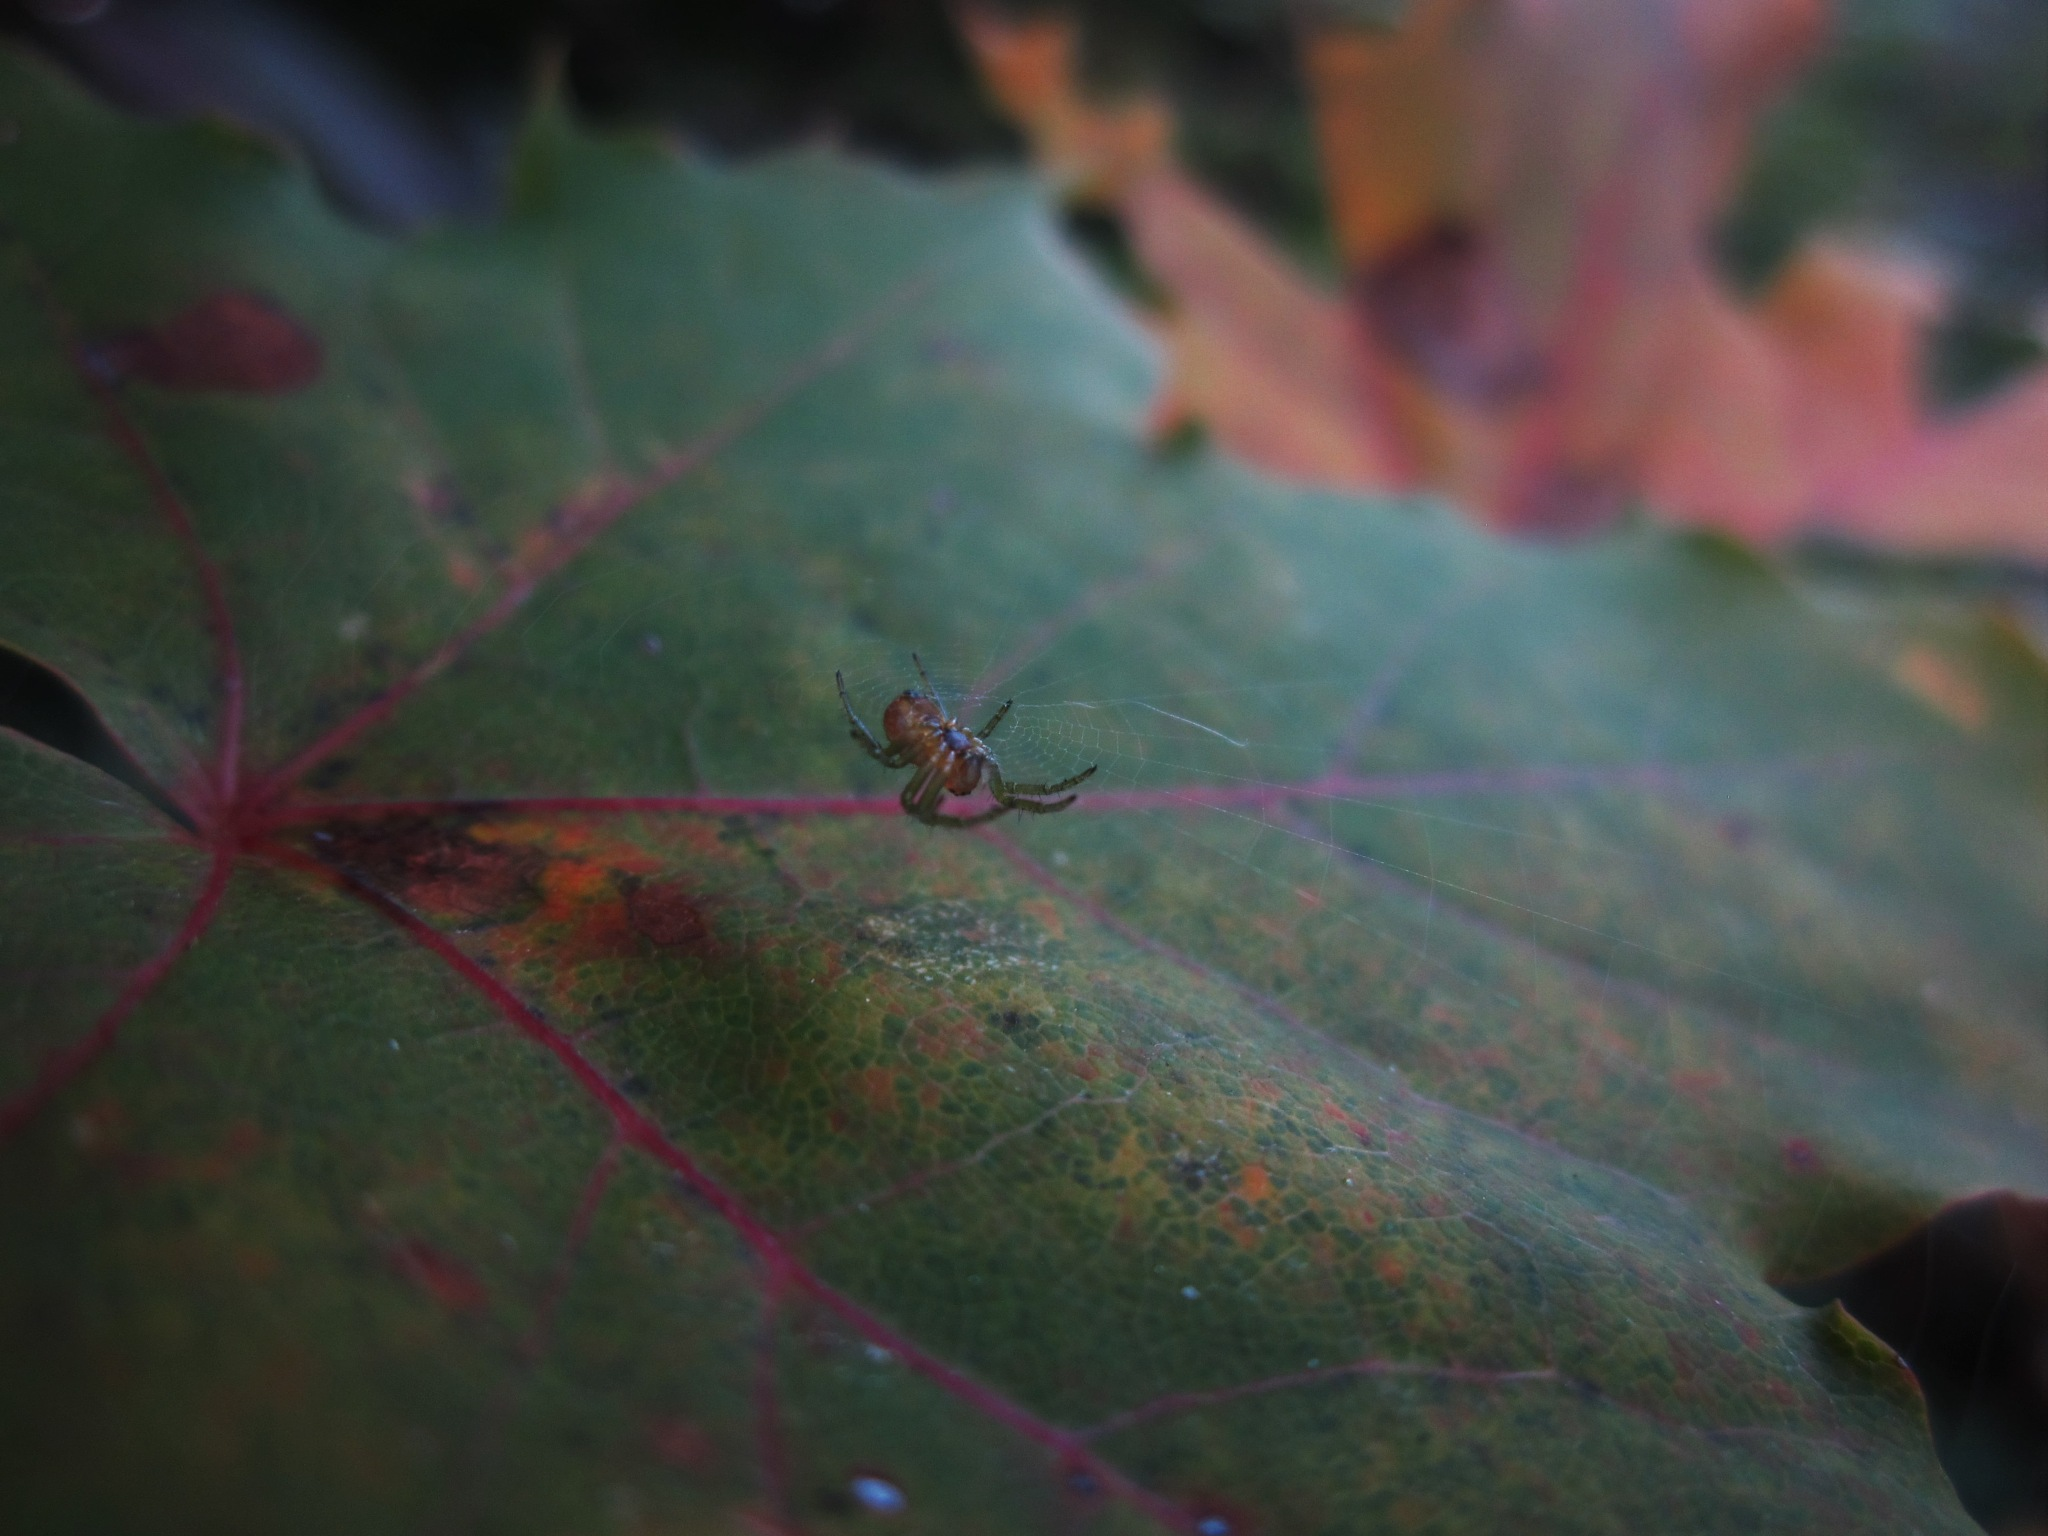 Little Spider by Marija Konjik